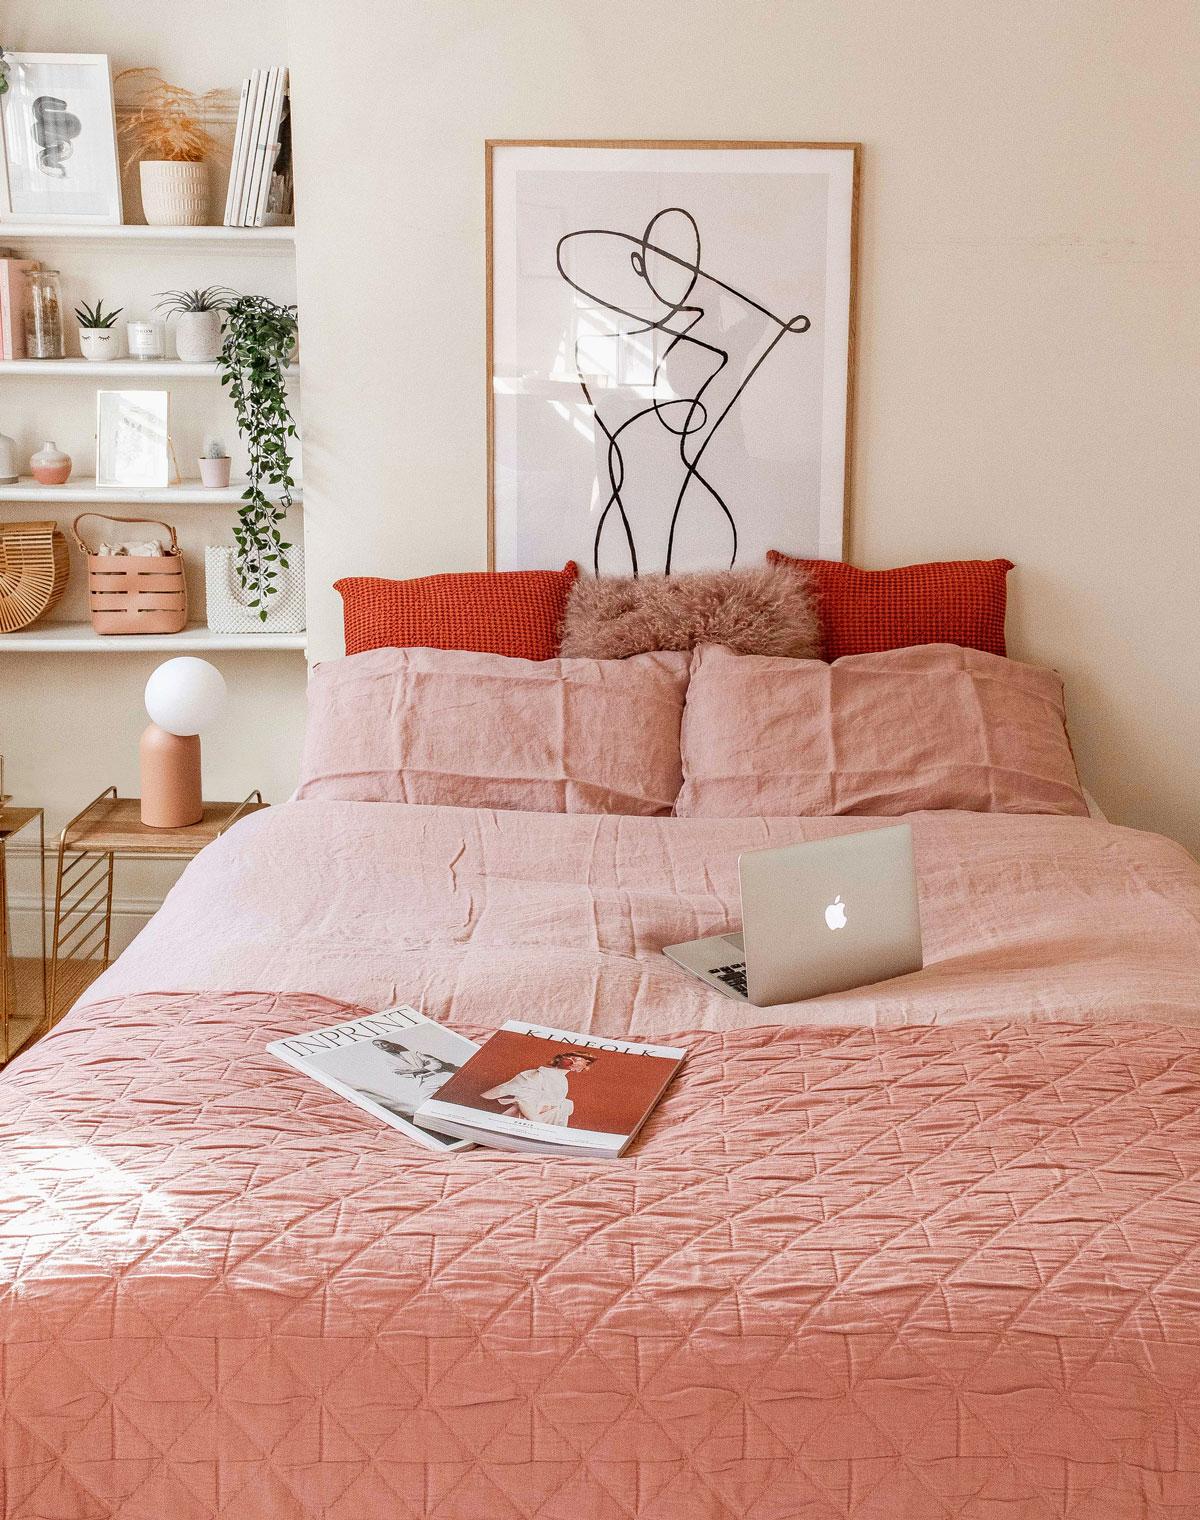 kelsey-heinrichs-@kelseyinlondon-made-bedroom-decoration-bedroom-ideas-bedroom-furniture-bedroom-inspiration-bedroom-styling-2